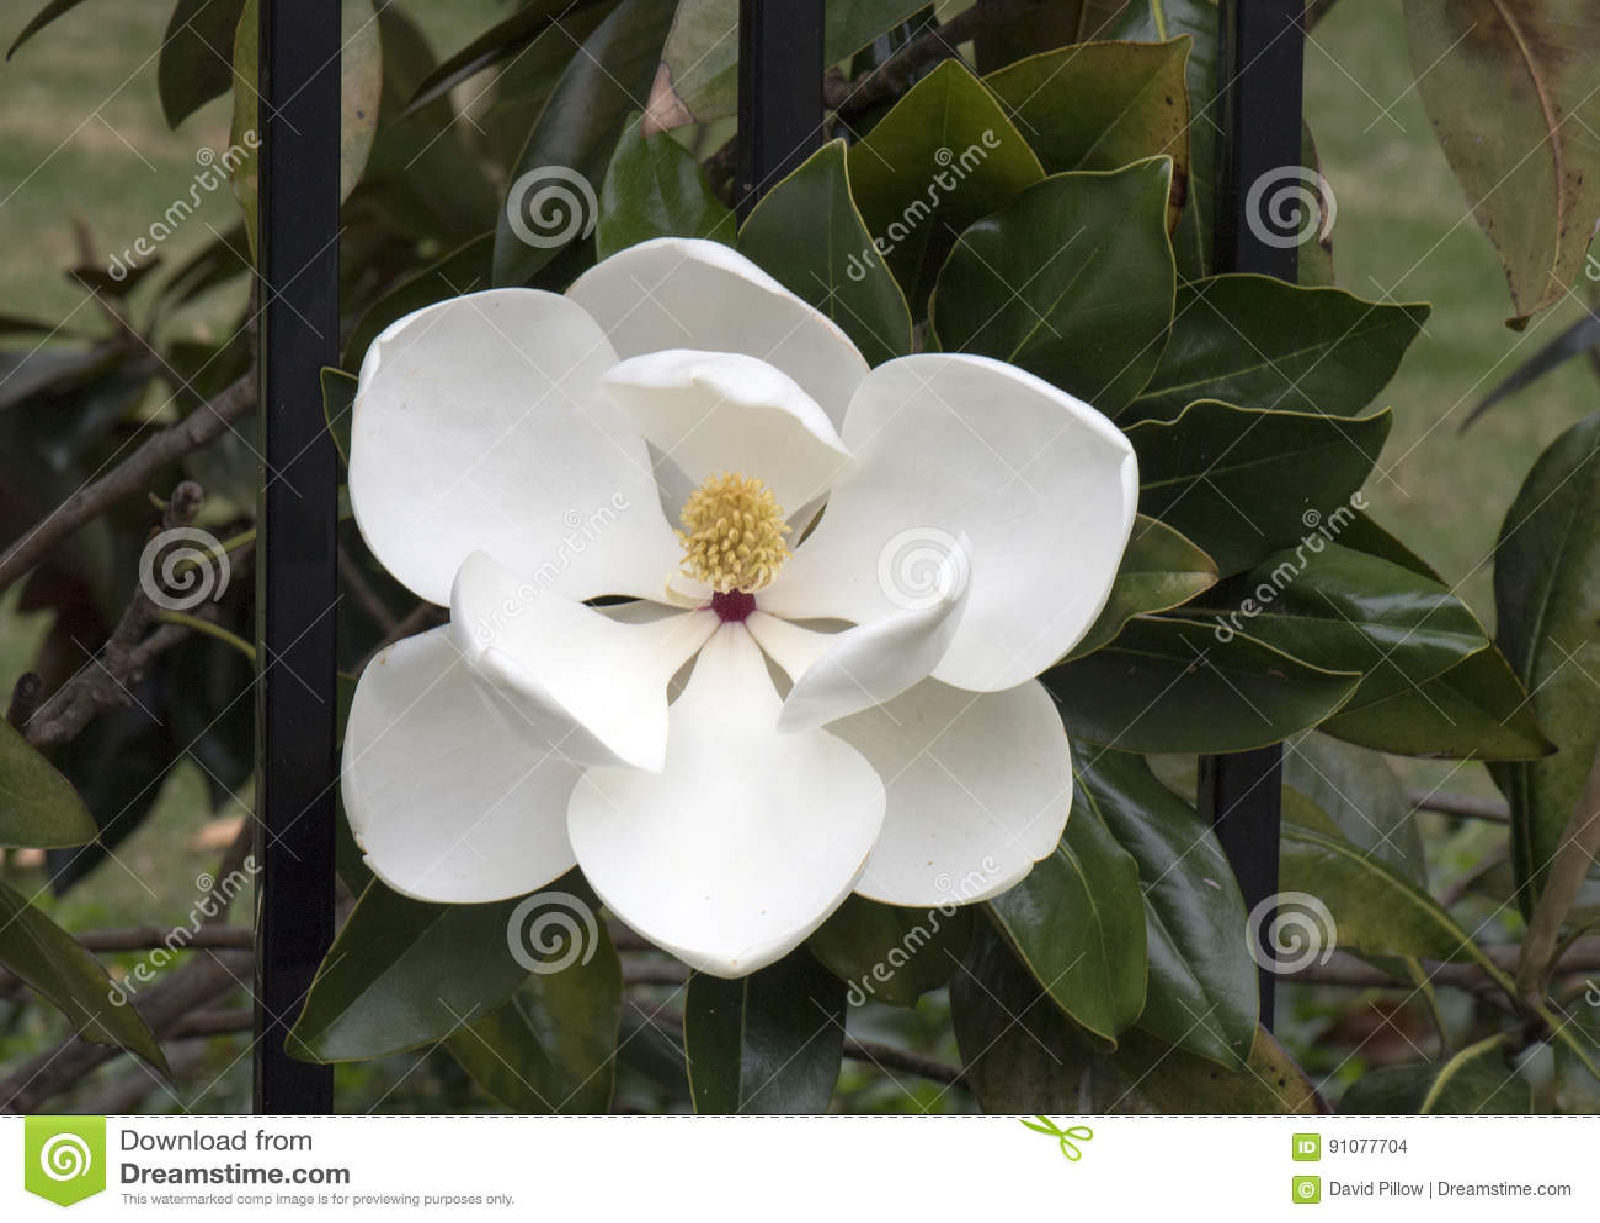 Closeup Of Flower Of The Magnolia Grandiflora Tree Stock Photo